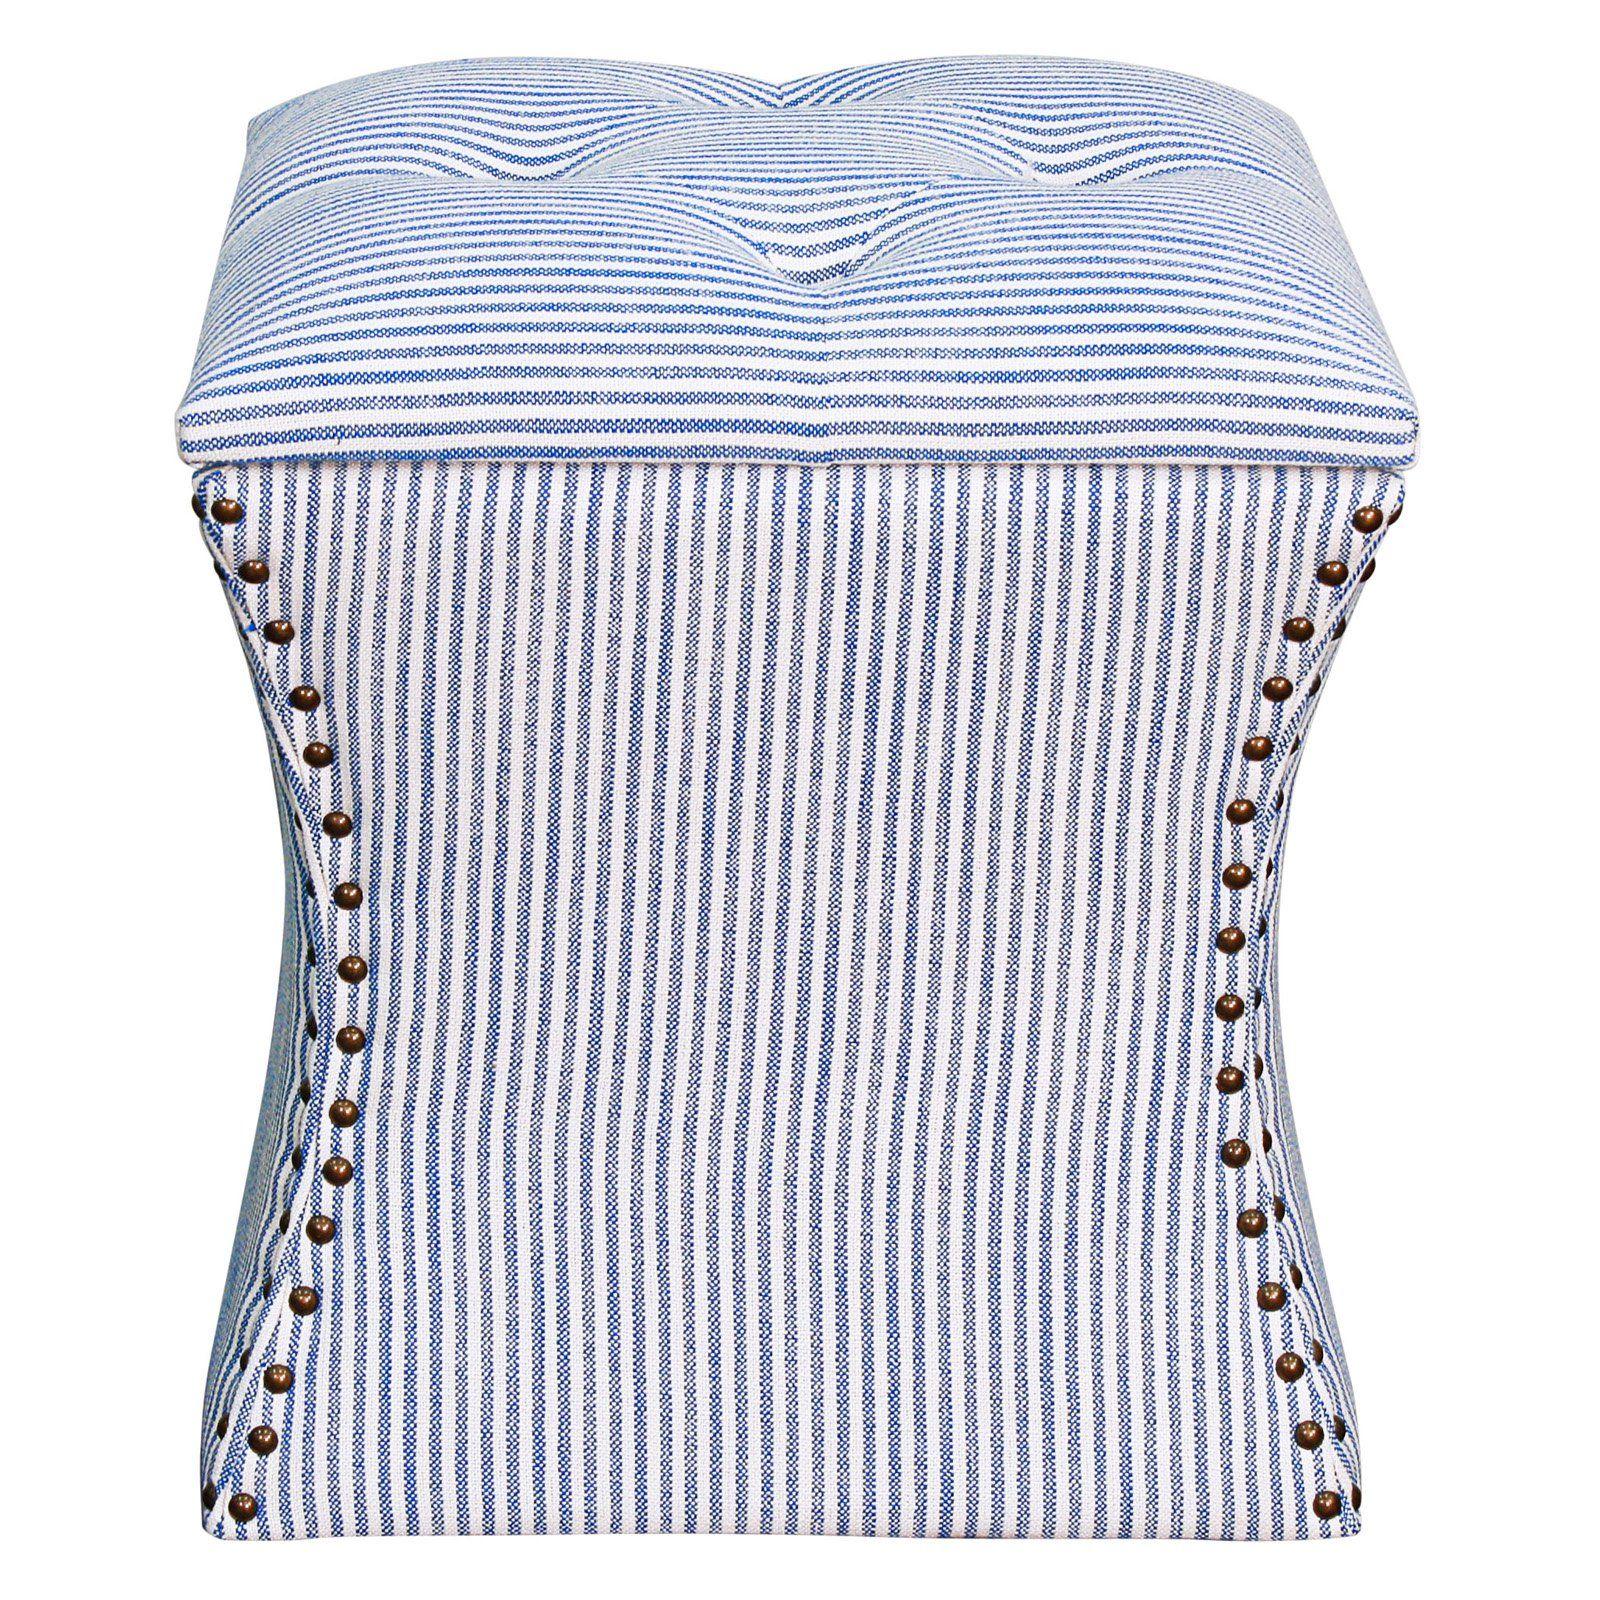 Strange New Pacific Direct Inc Amelia Nailhead Storage Ottoman Blue Camellatalisay Diy Chair Ideas Camellatalisaycom